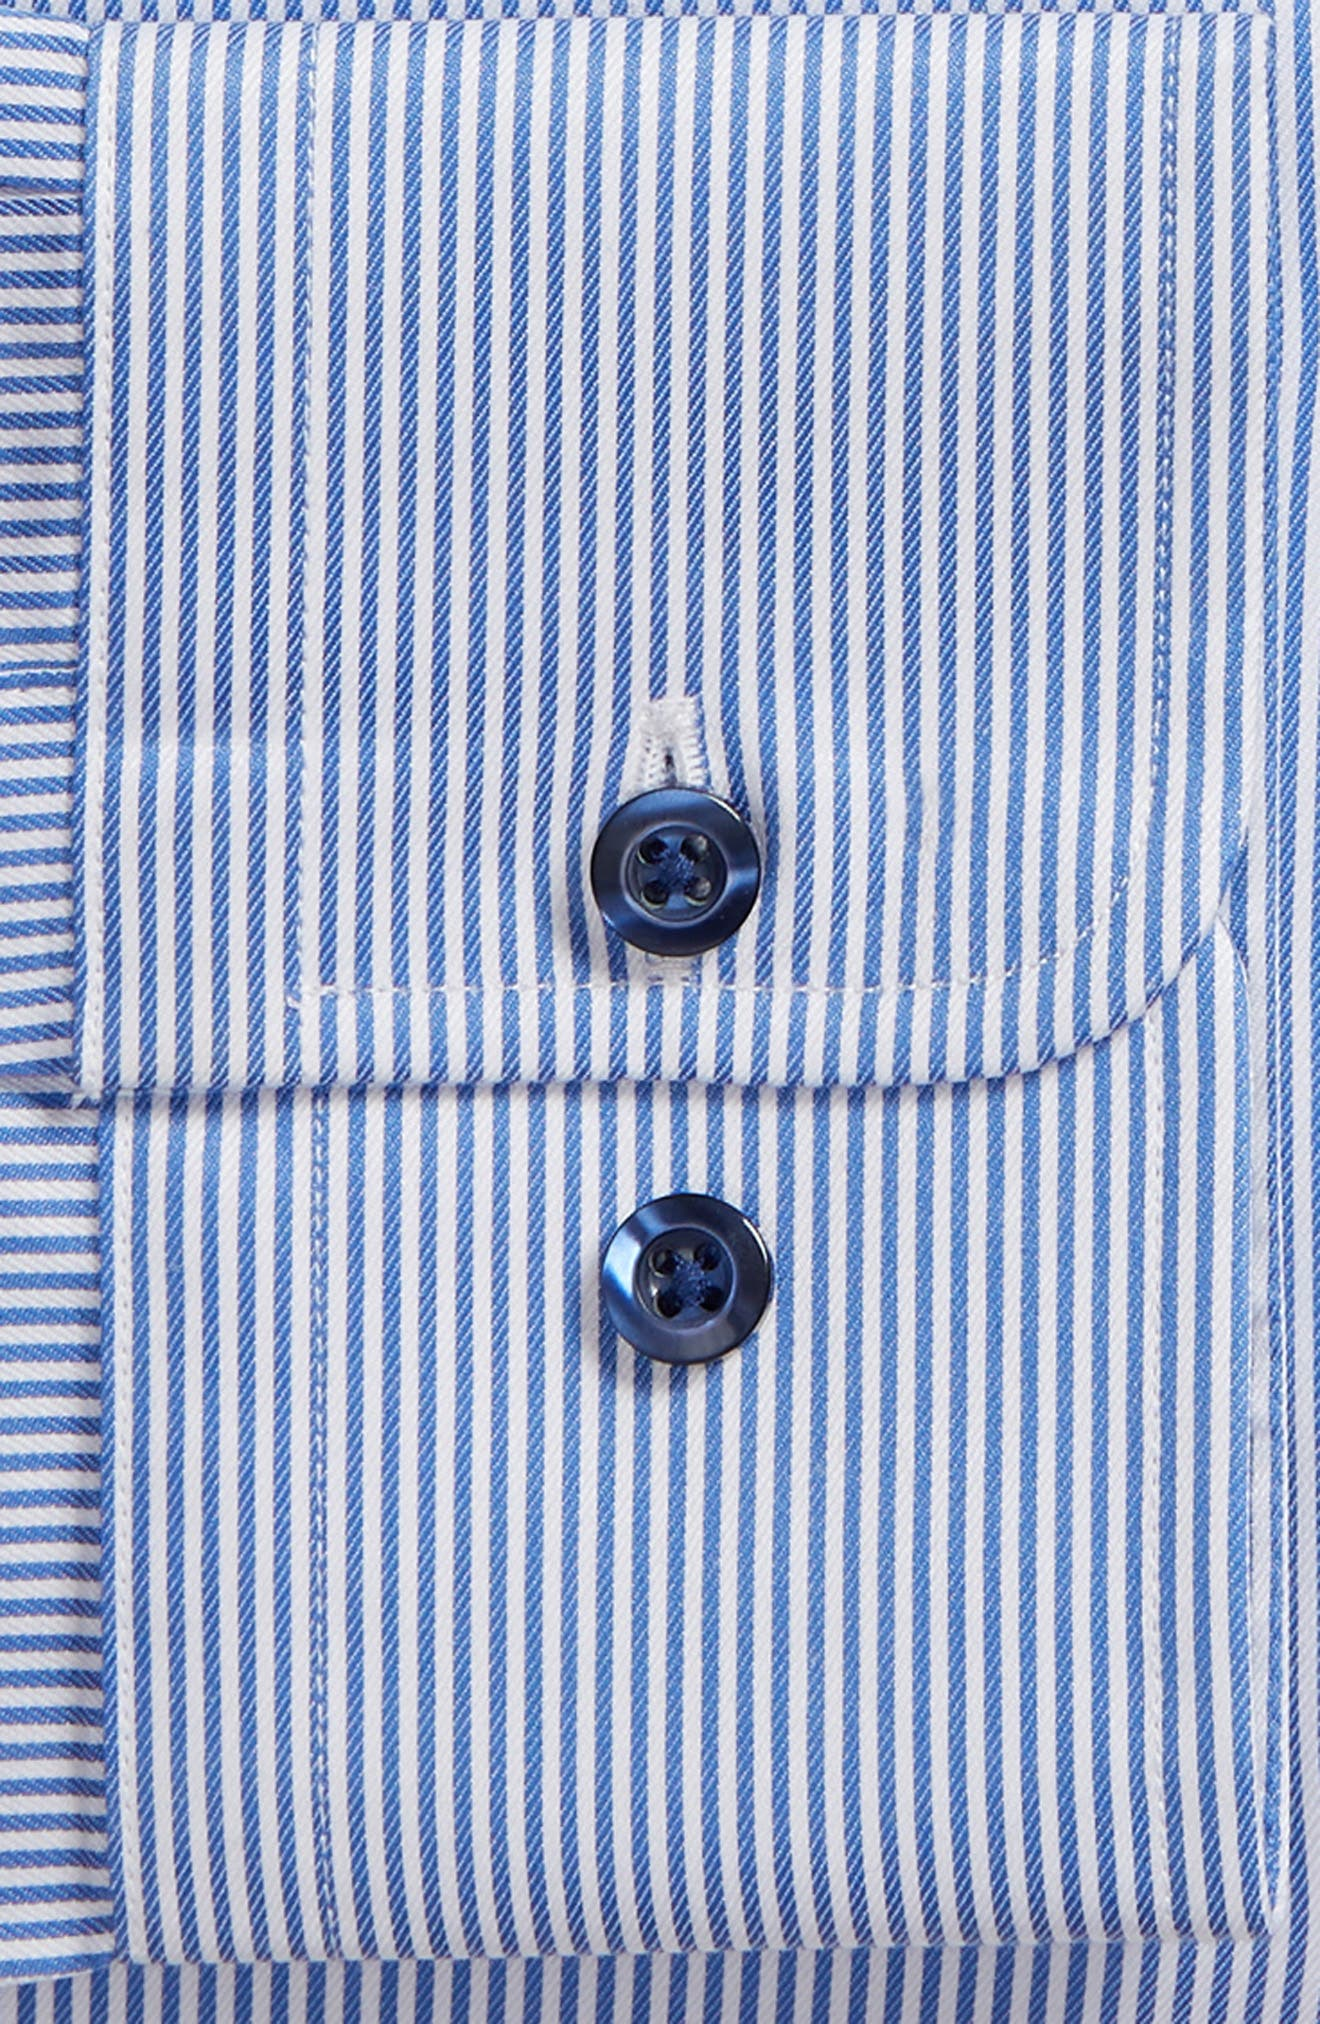 Trim Fit Stripe Dress Shirt,                             Alternate thumbnail 6, color,                             BLUE